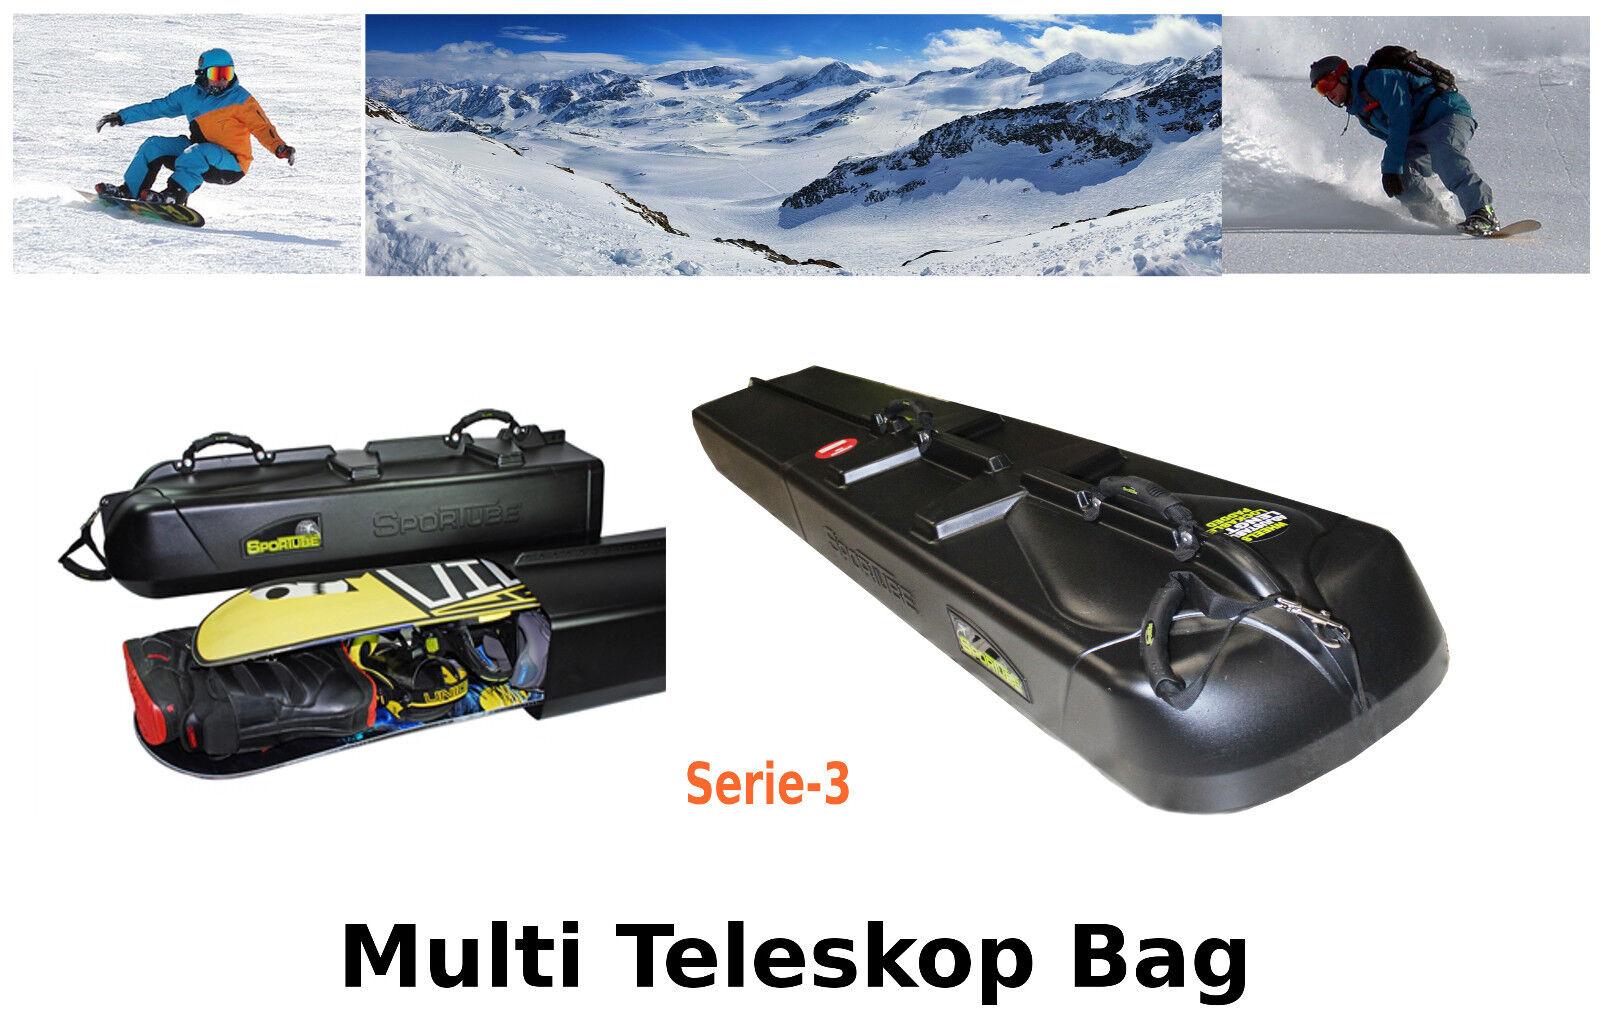 Teleskop Snowboardtasche Snowboardbag Raceboard  Freeride Freestyle Board  discount low price